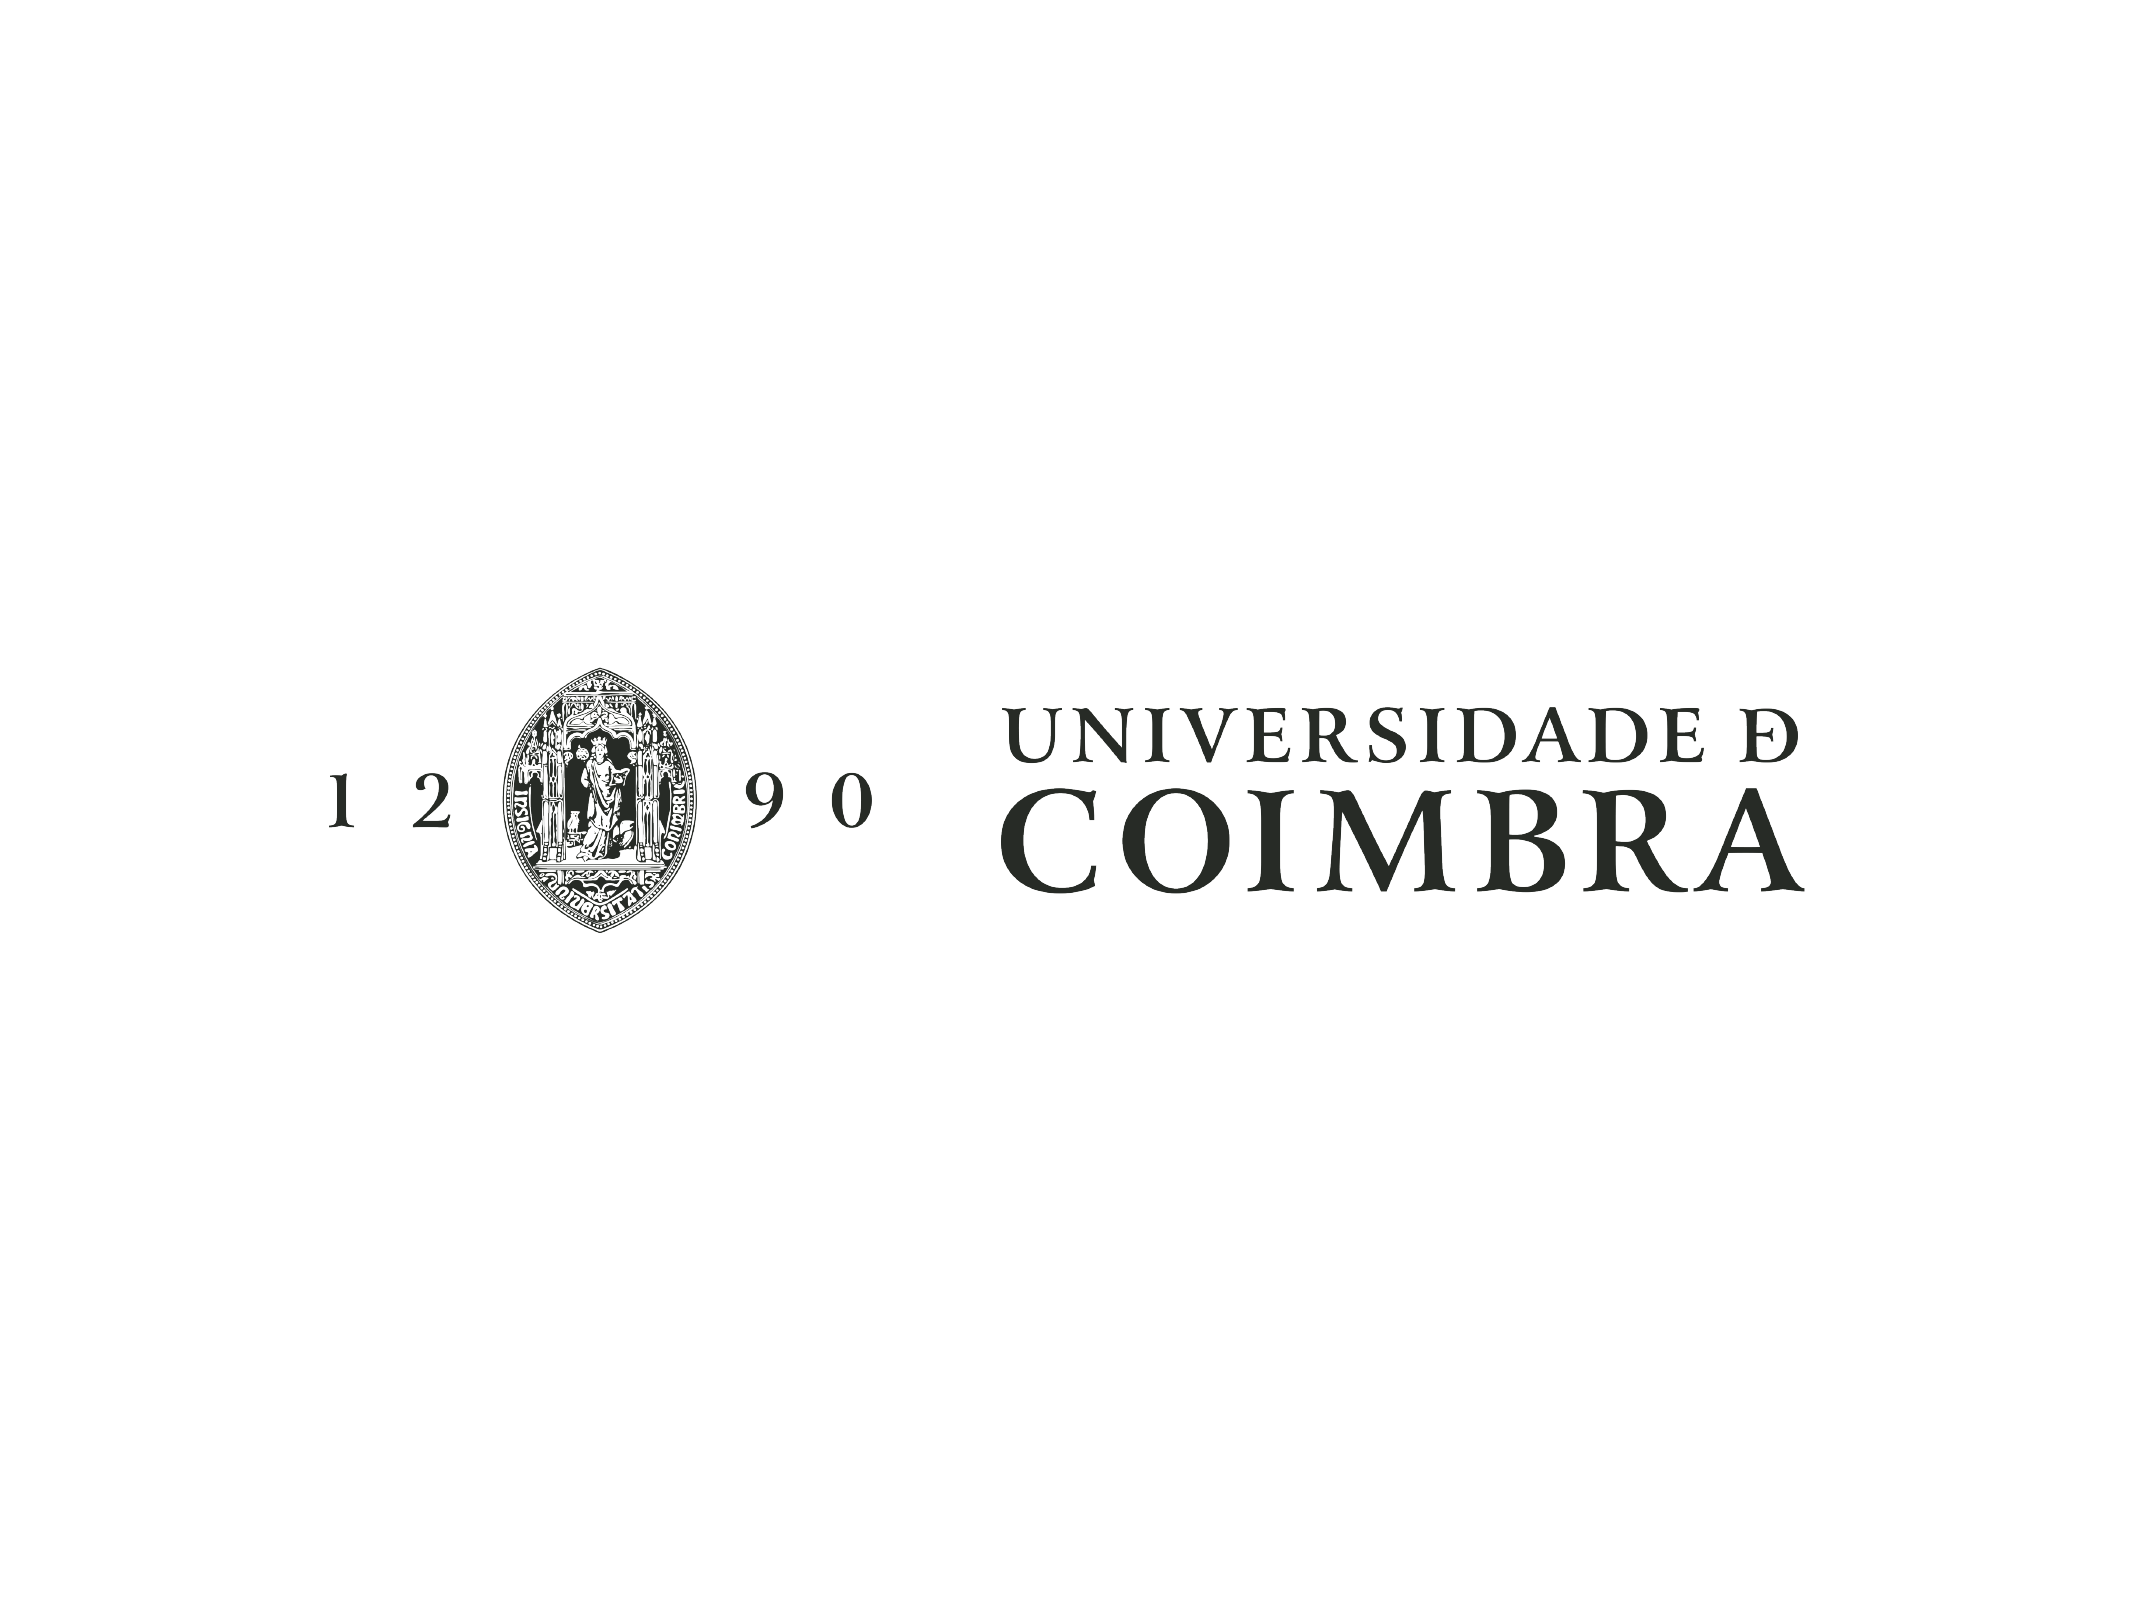 TRIPLE partner logo - University of Coimbra